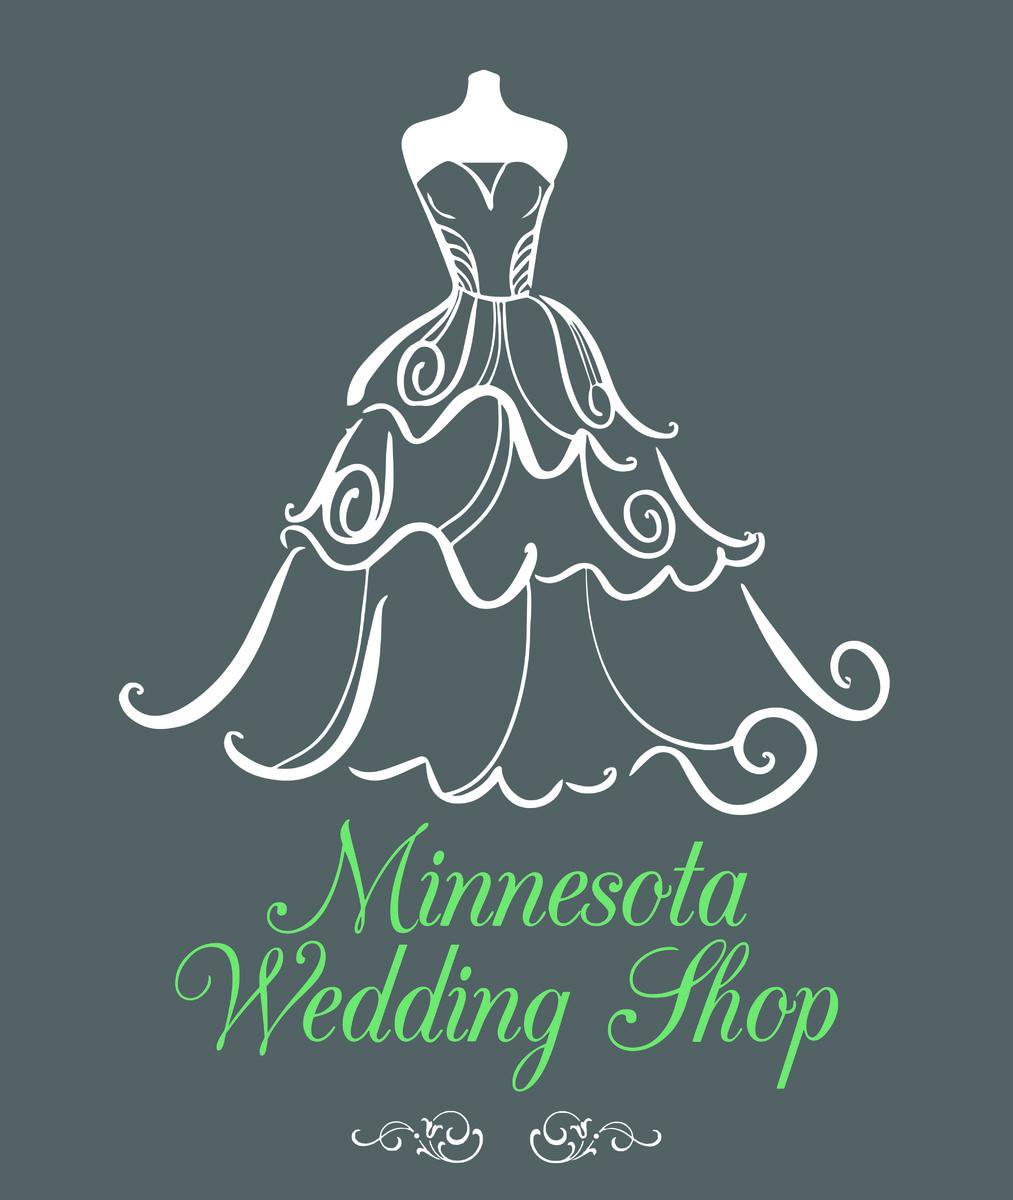 Minneapolis Wedding Gowns: Minnesota Wedding Shop